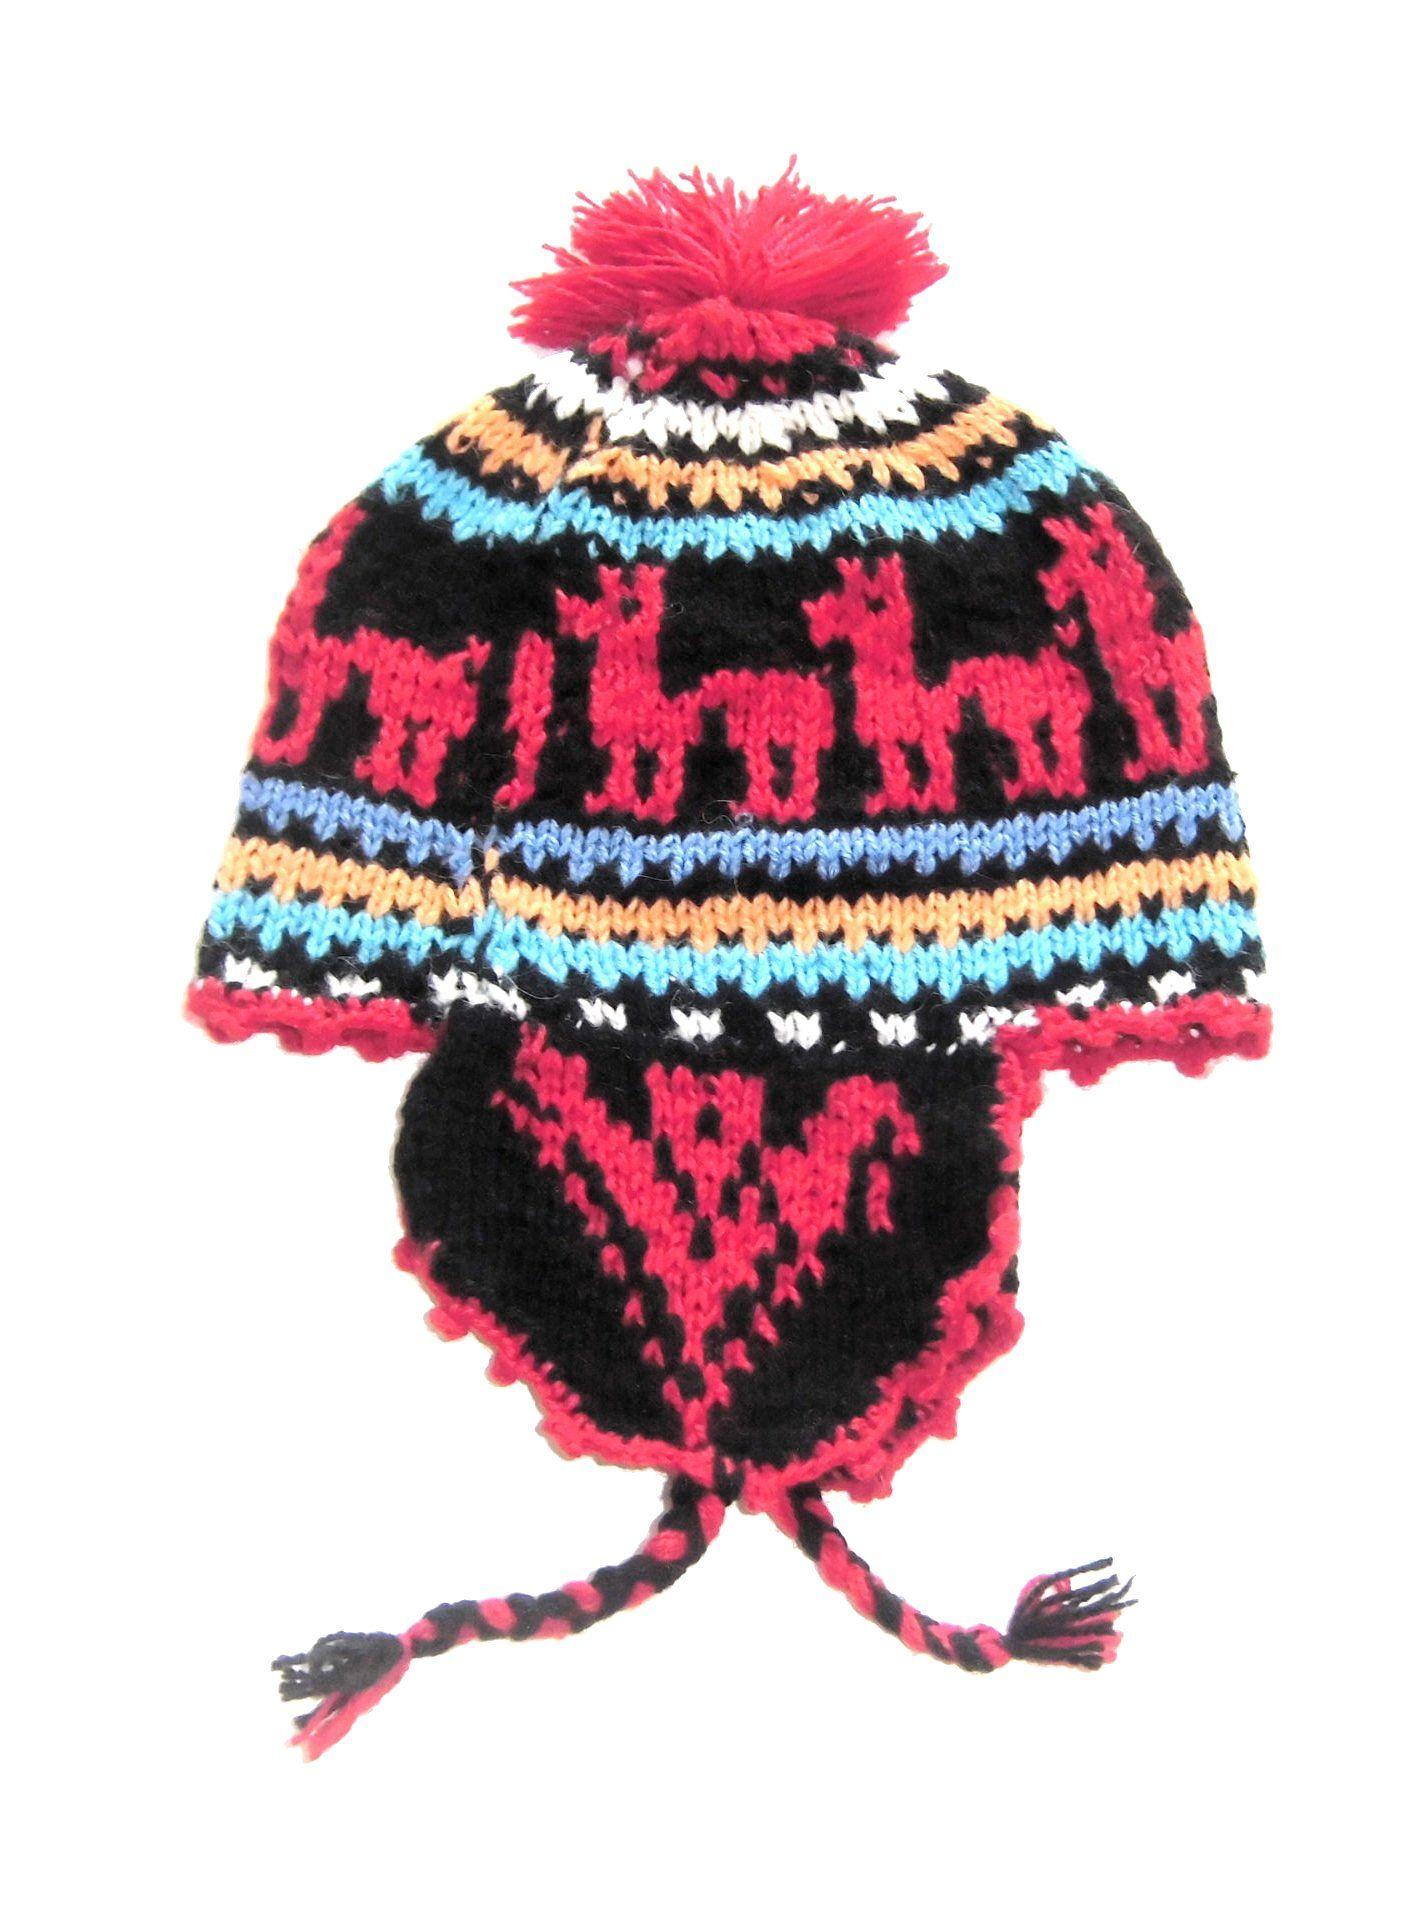 60b87947b8a74 Alpacaandmore peruanische traditionell gestrickte Chullo Alpakawolle Muetze  Rot  Amazon.de  Bekleidung